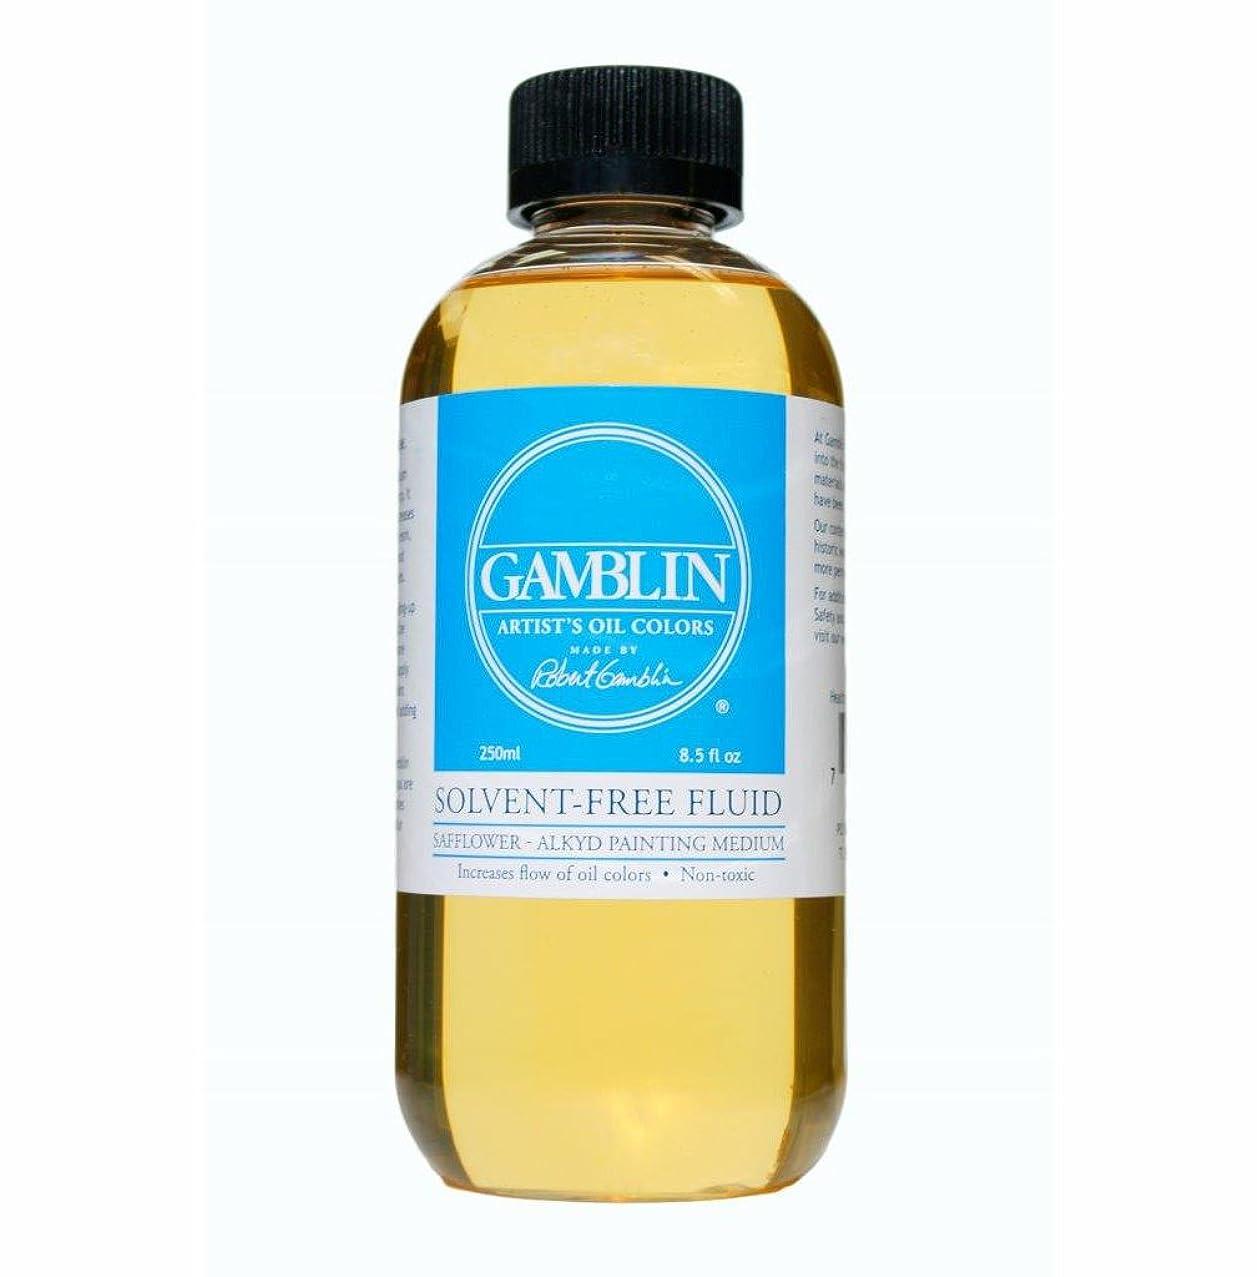 Gamblin Solvent-Free Fluid Medium 8.5 oz Bottle